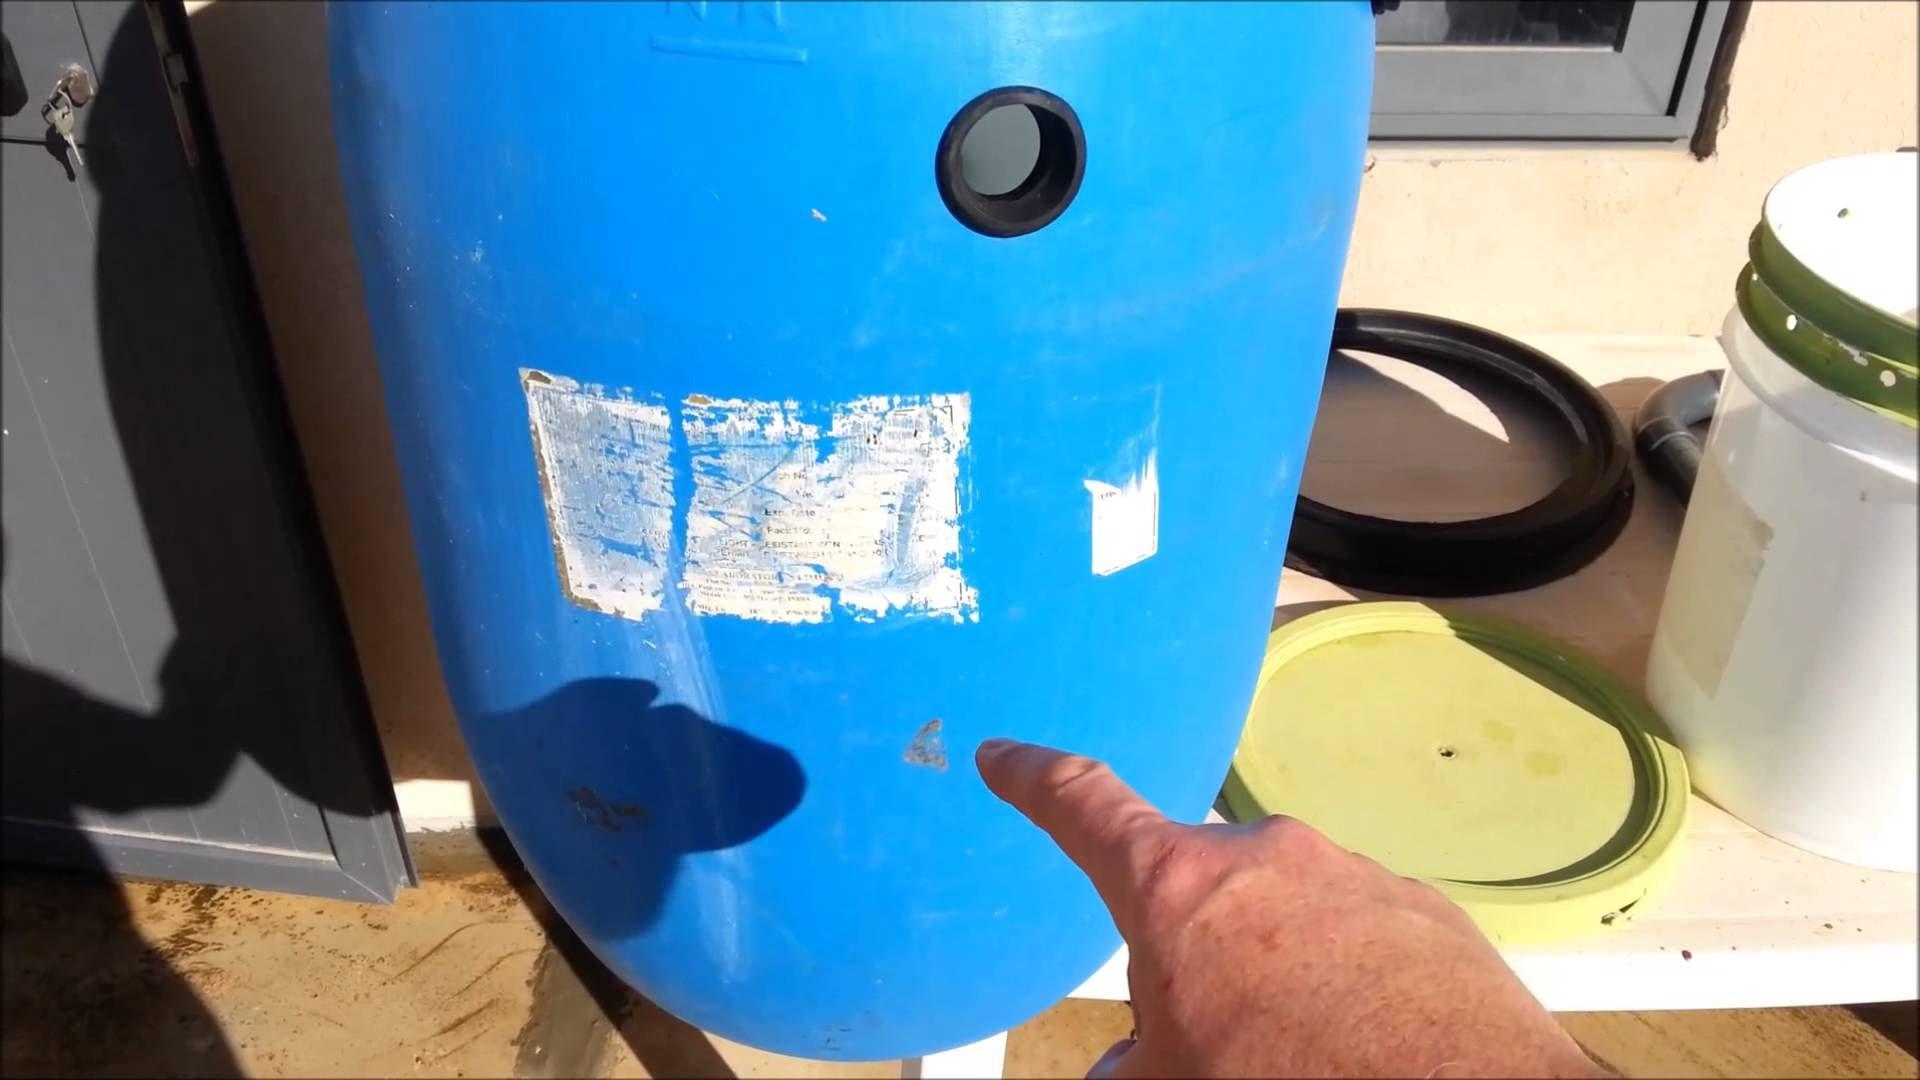 How to build a radial flow filter diy aquaponics